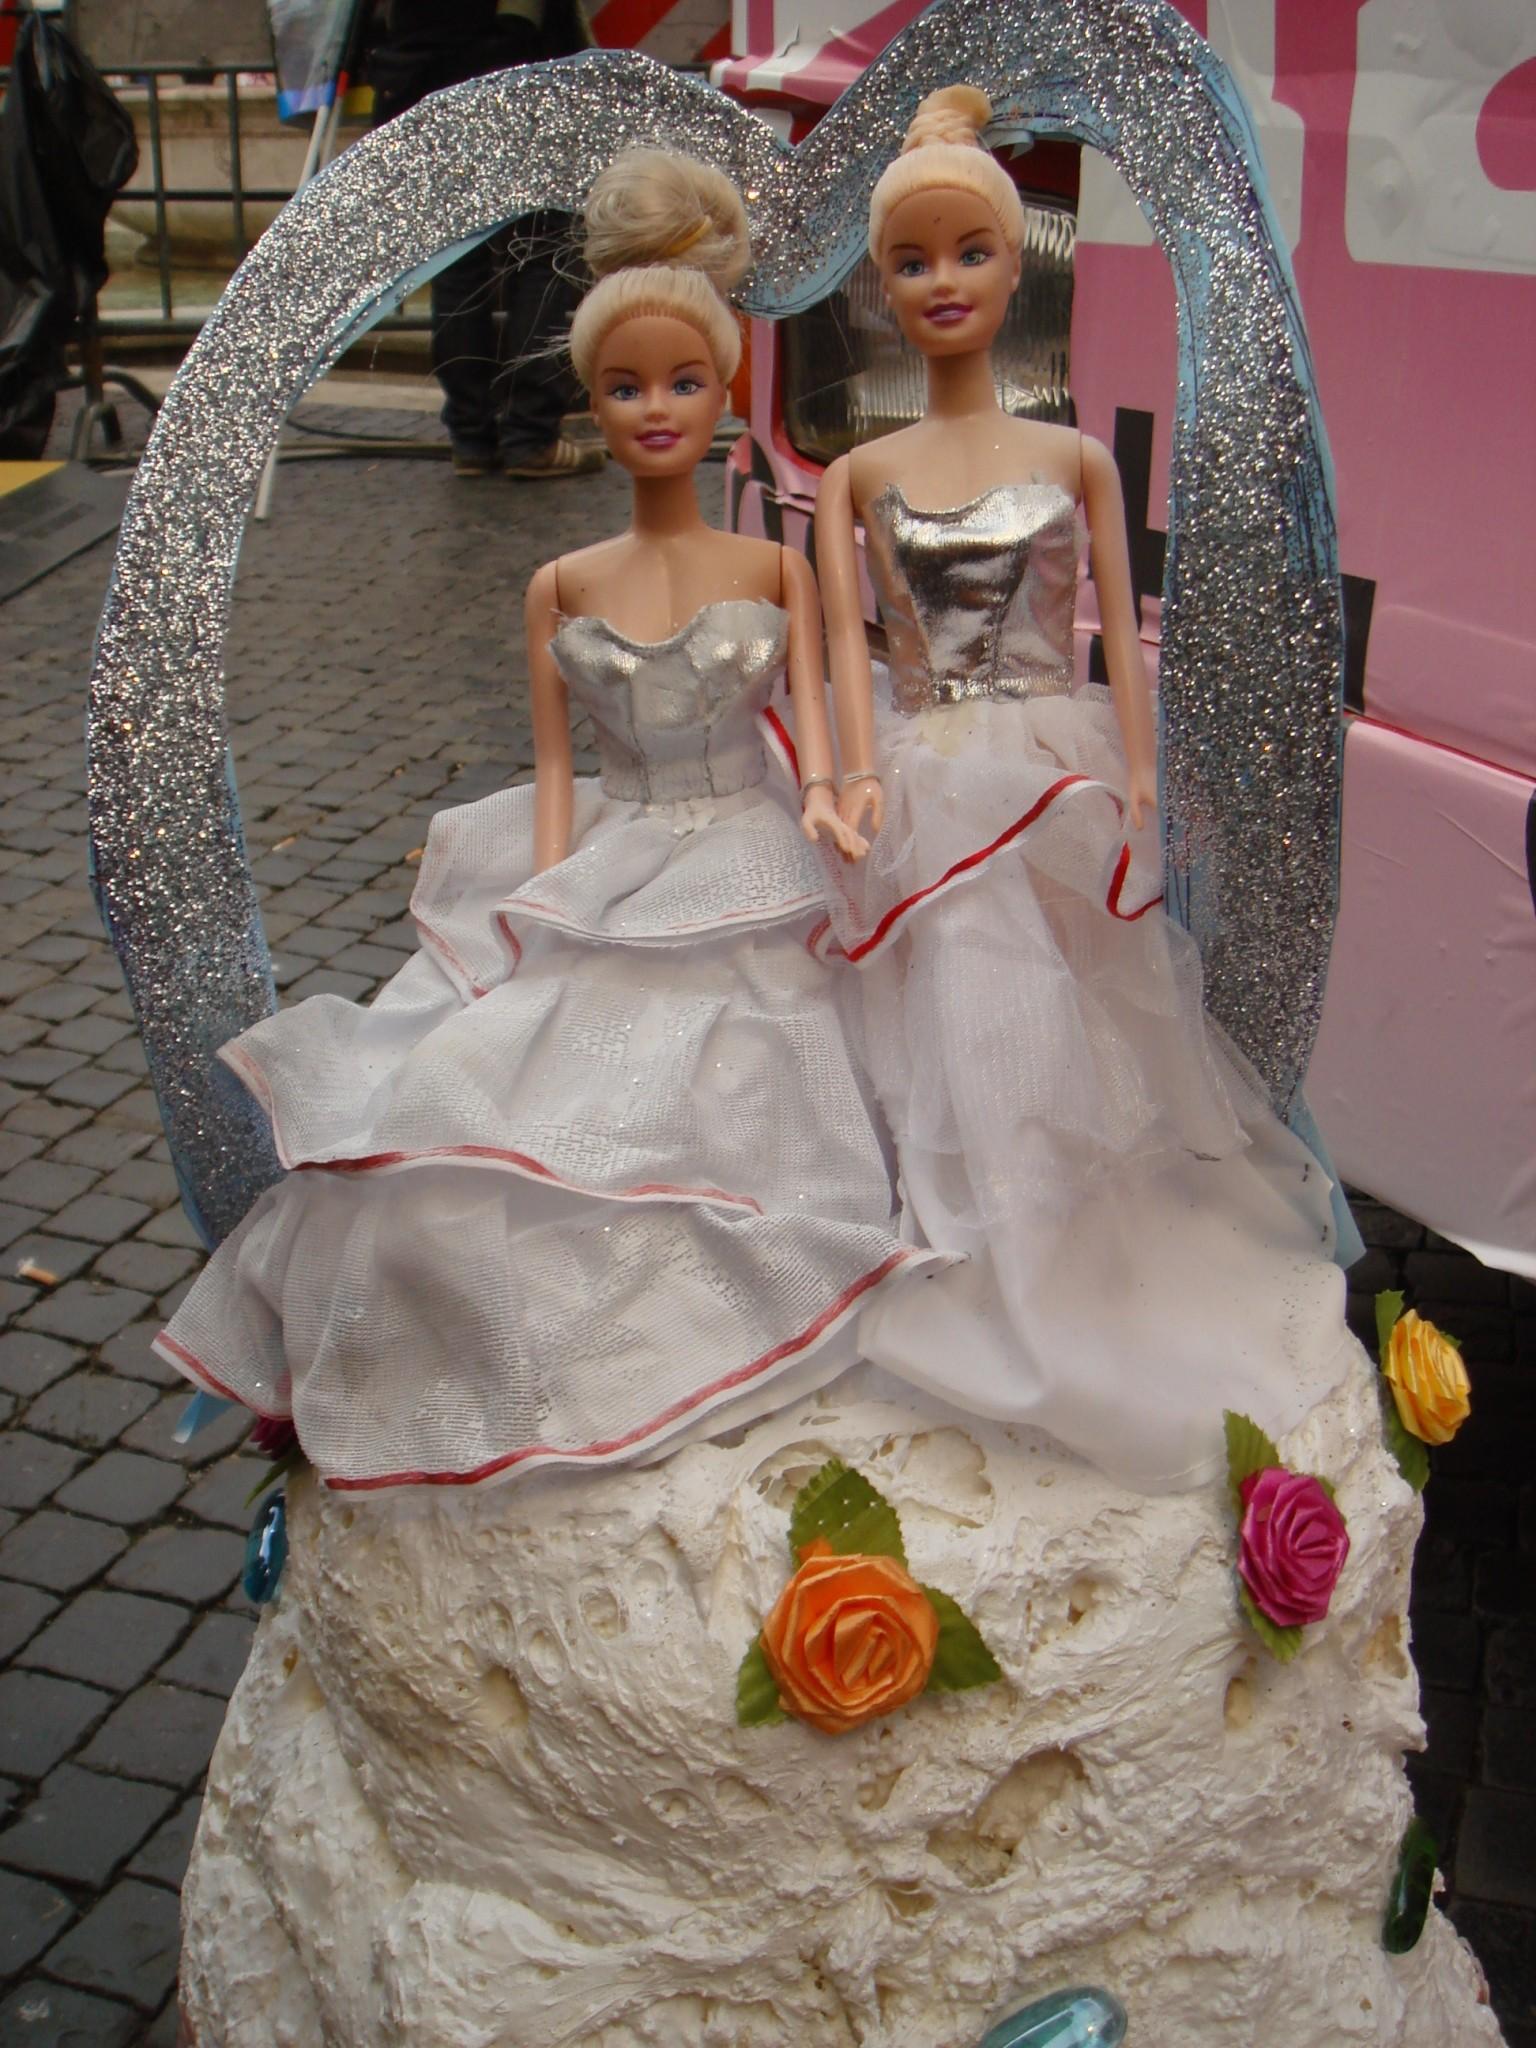 Auguri Matrimonio Omosessuale : Matrimonio omosessuale muore mazzini roma e l italiano